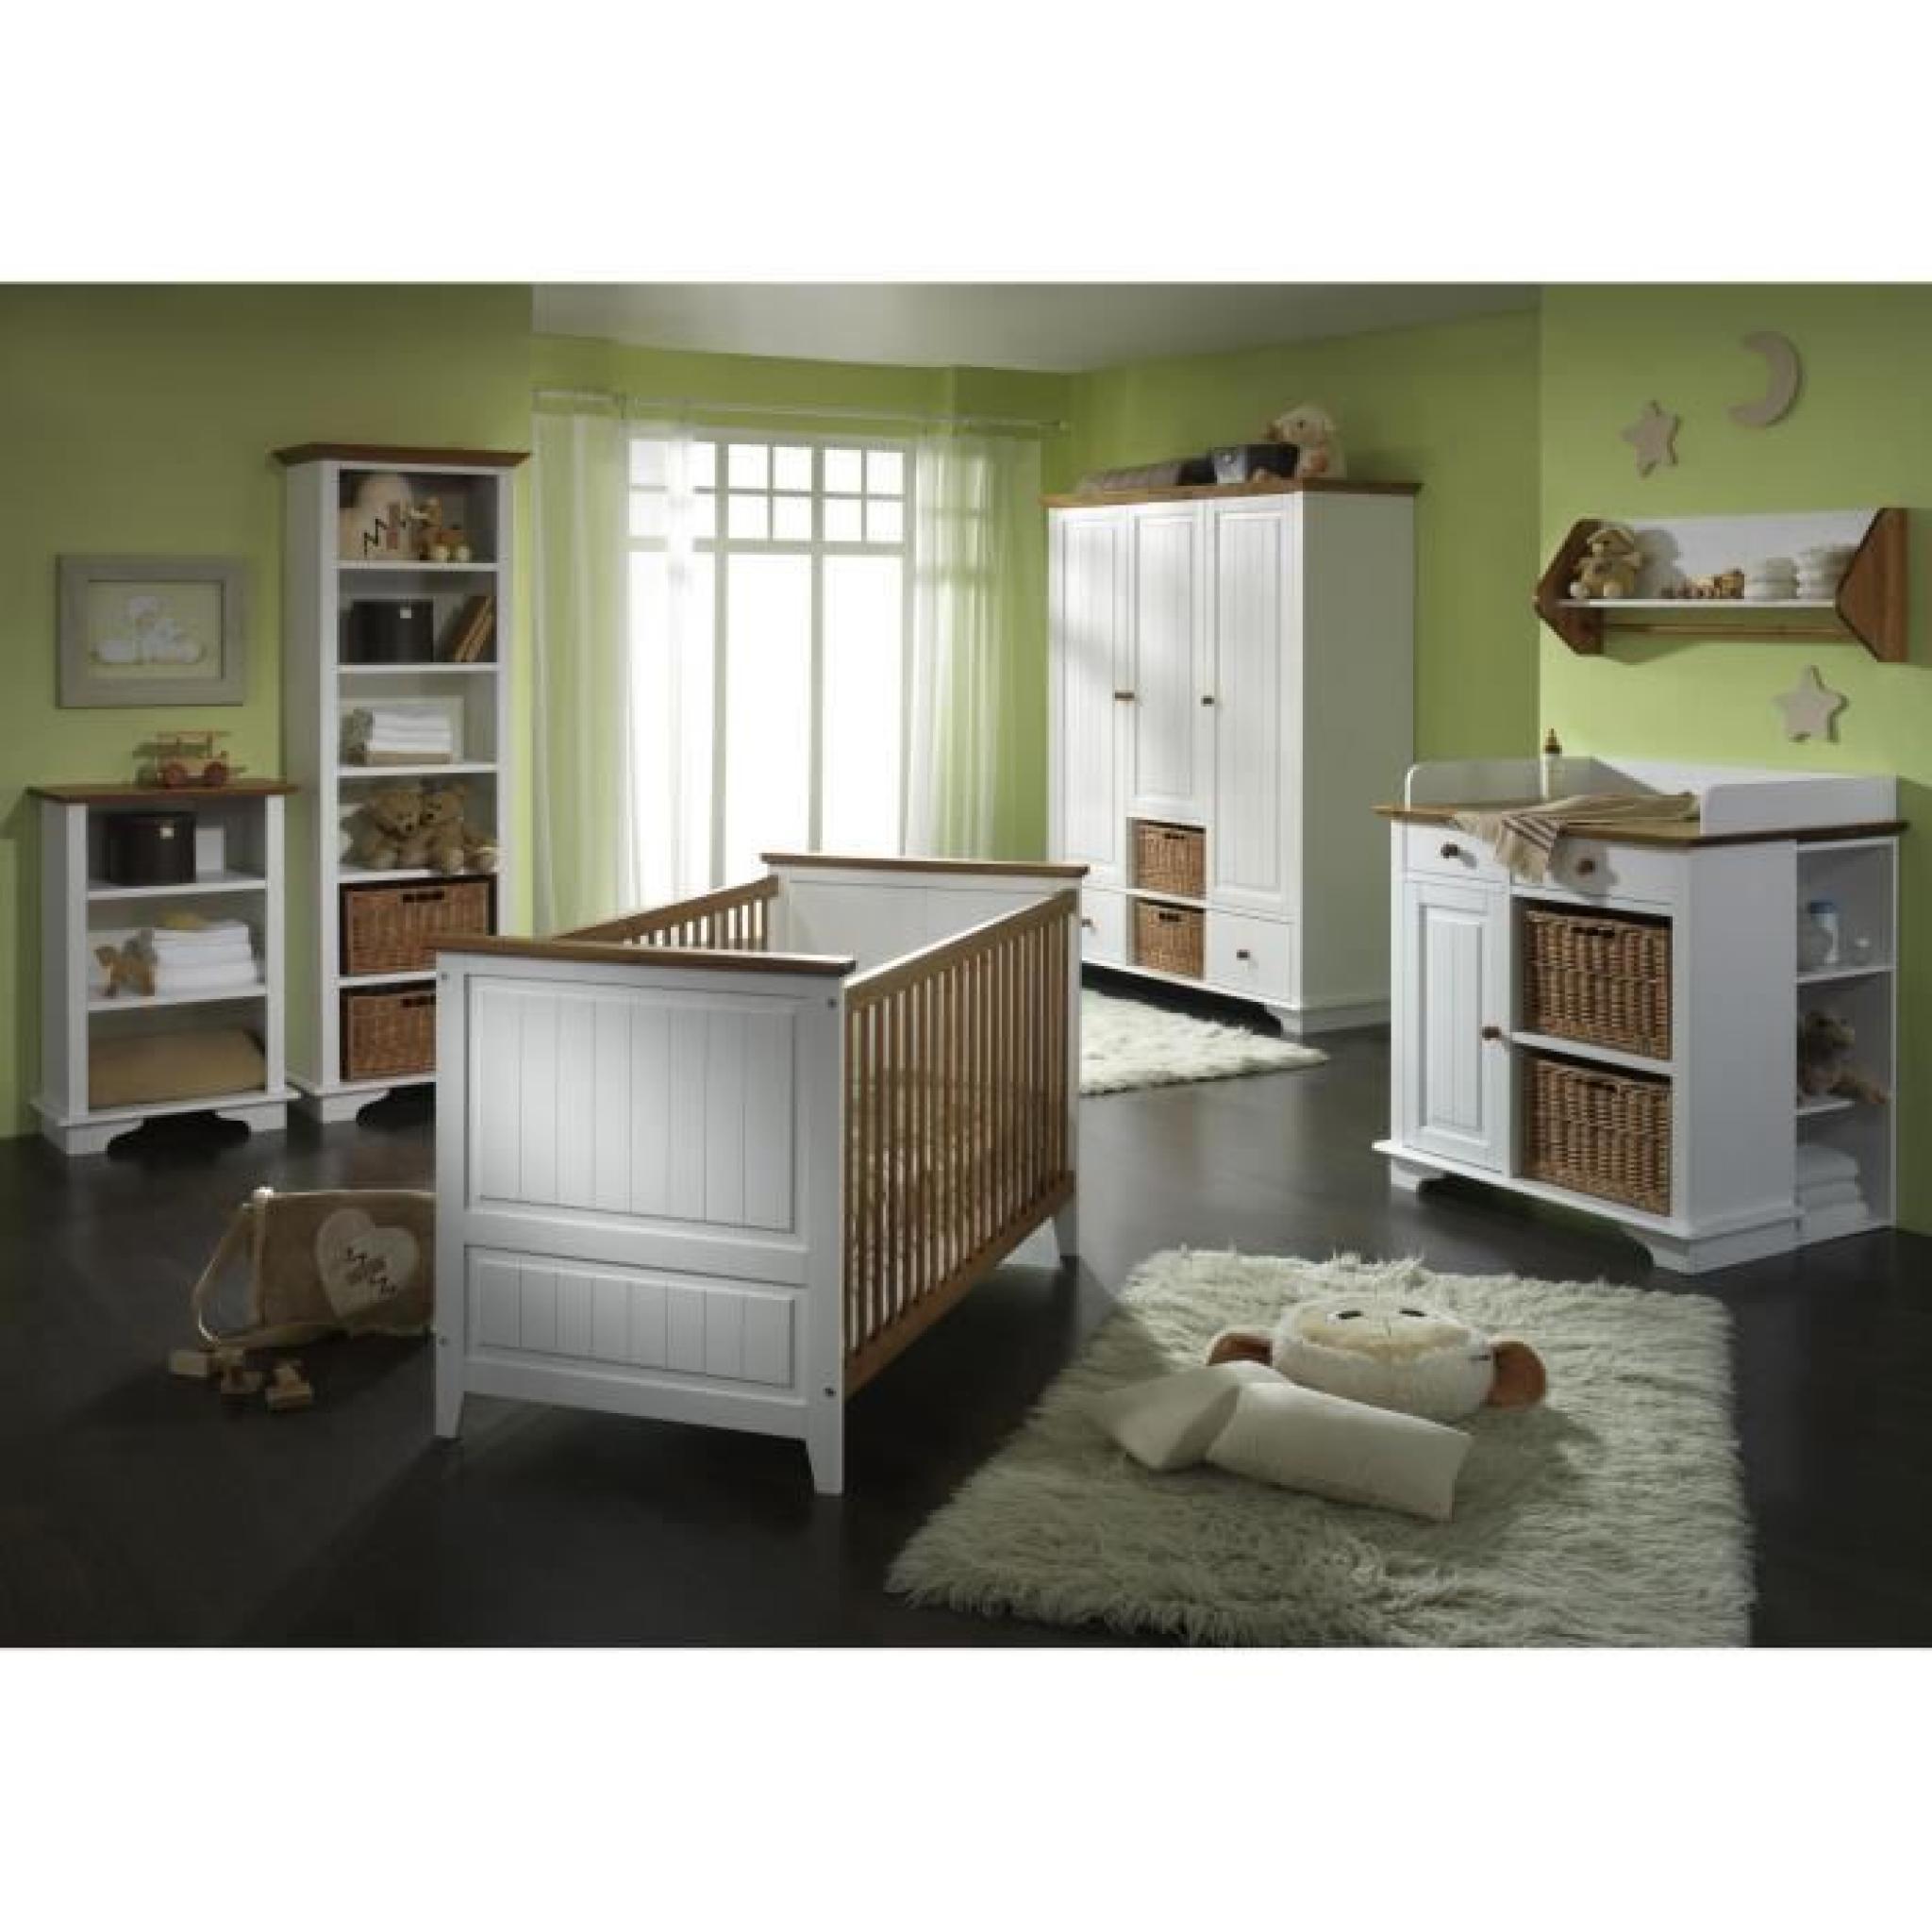 chambre b b compl te julia en pin massif blanc achat vente chambre complete pas cher. Black Bedroom Furniture Sets. Home Design Ideas